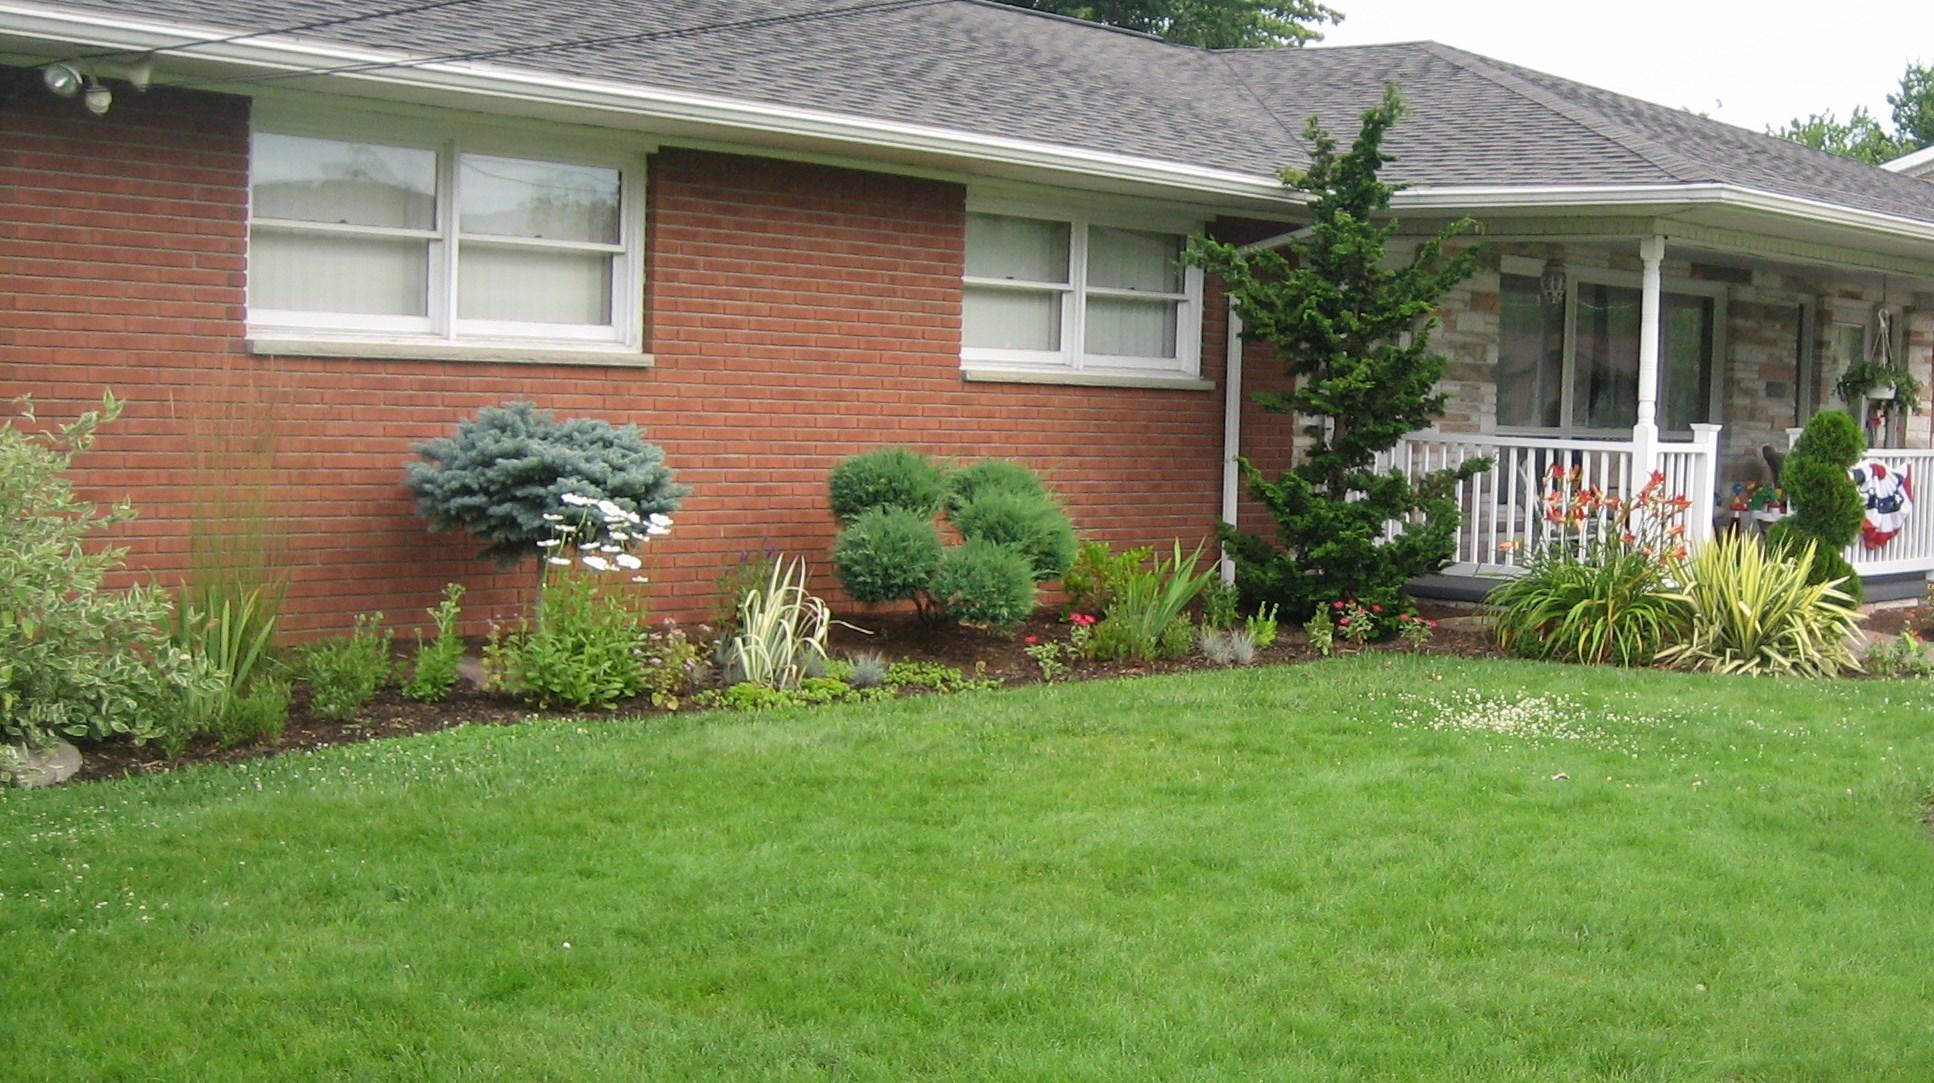 Planting Around House Foundations : Foundation plantings ? sorta like suburbia